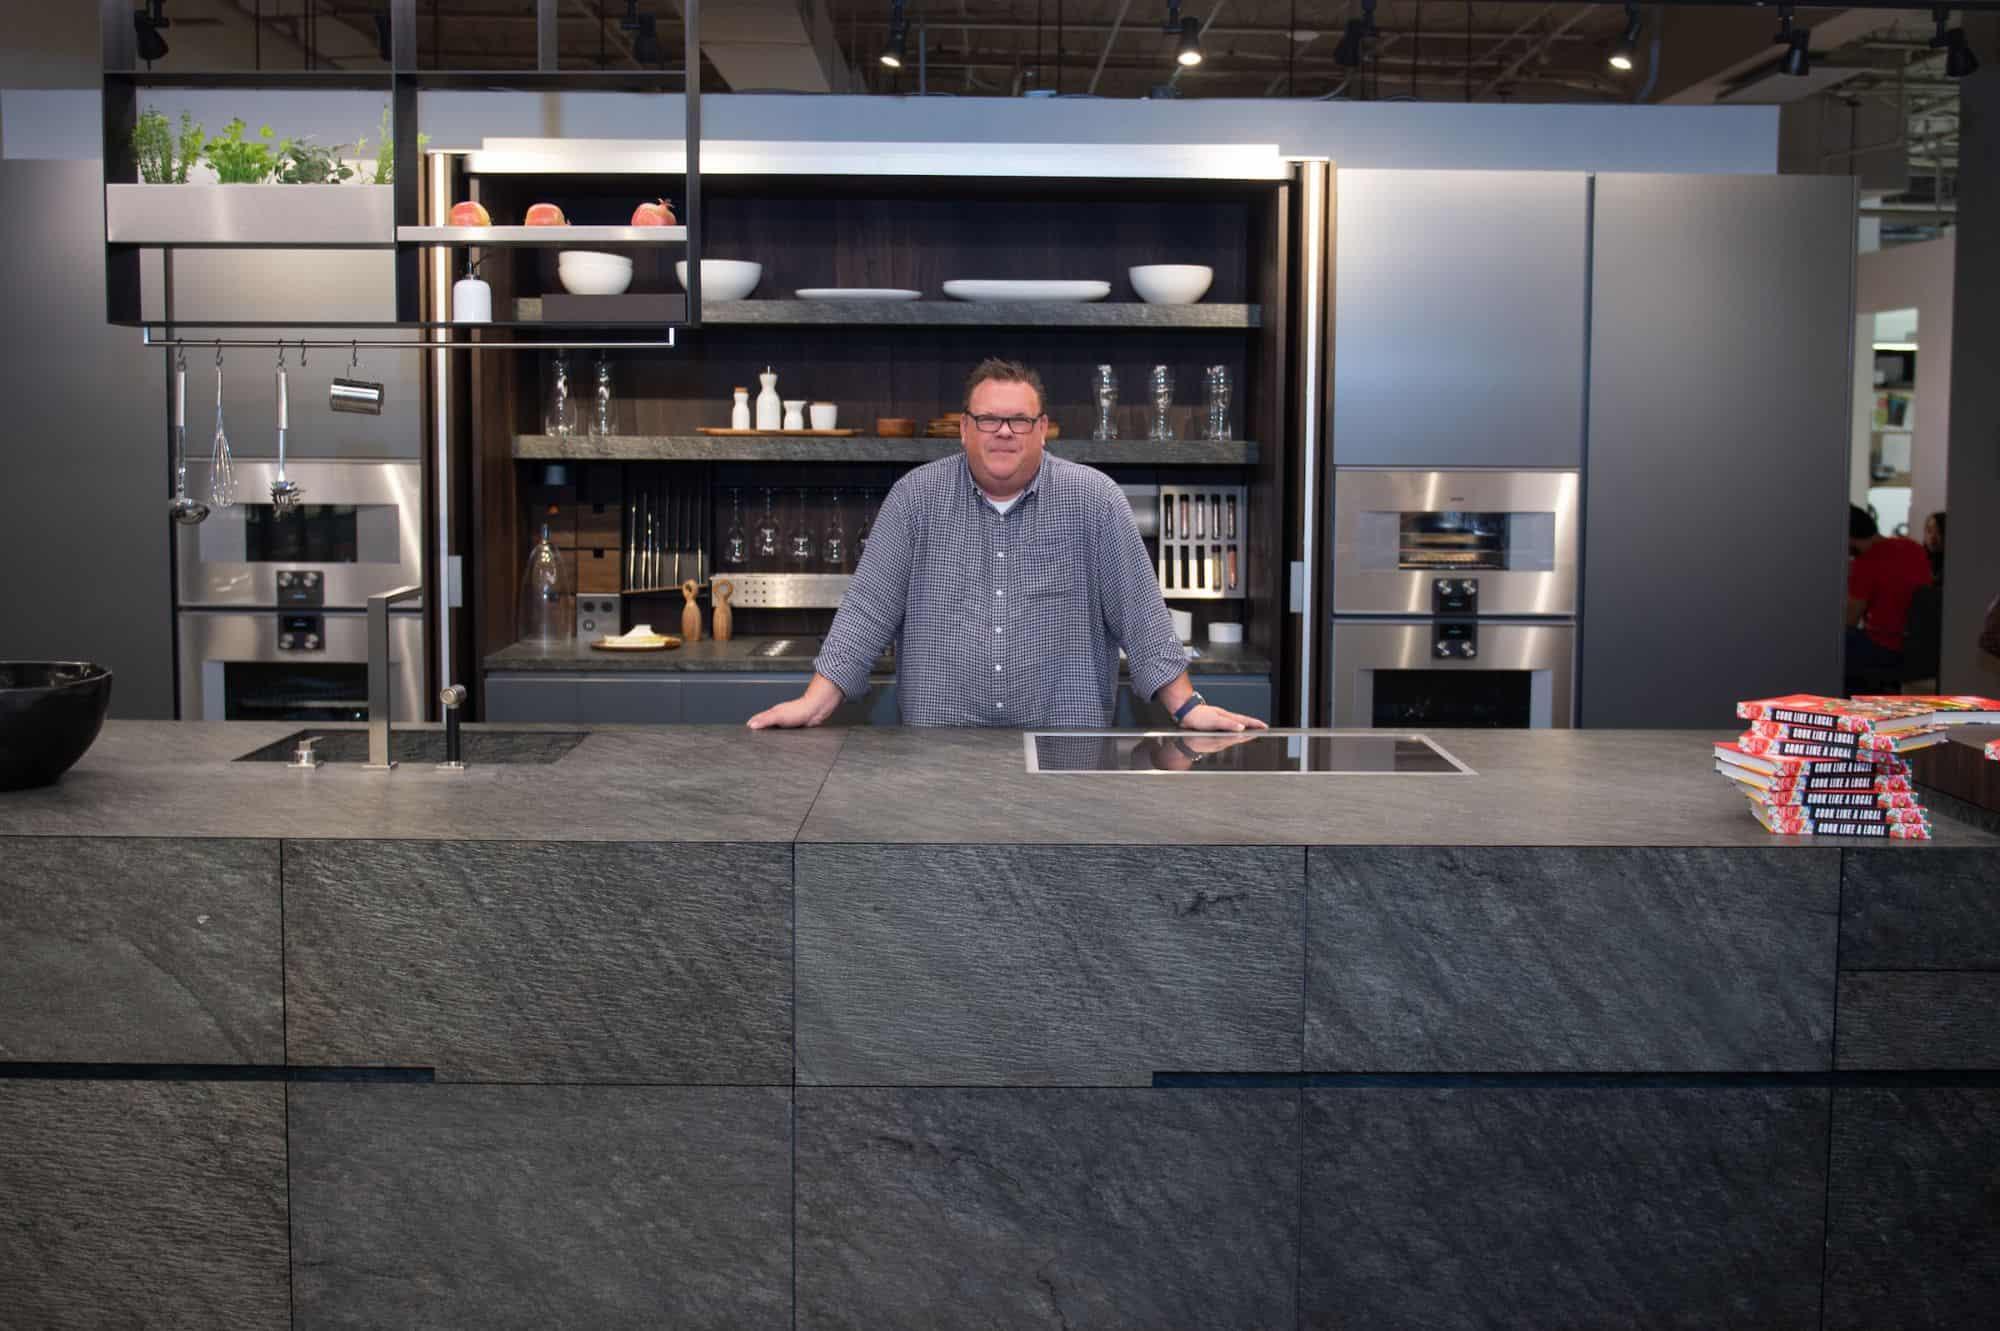 Award Winning Chef Chris Shepherd visits eggersmann Houston